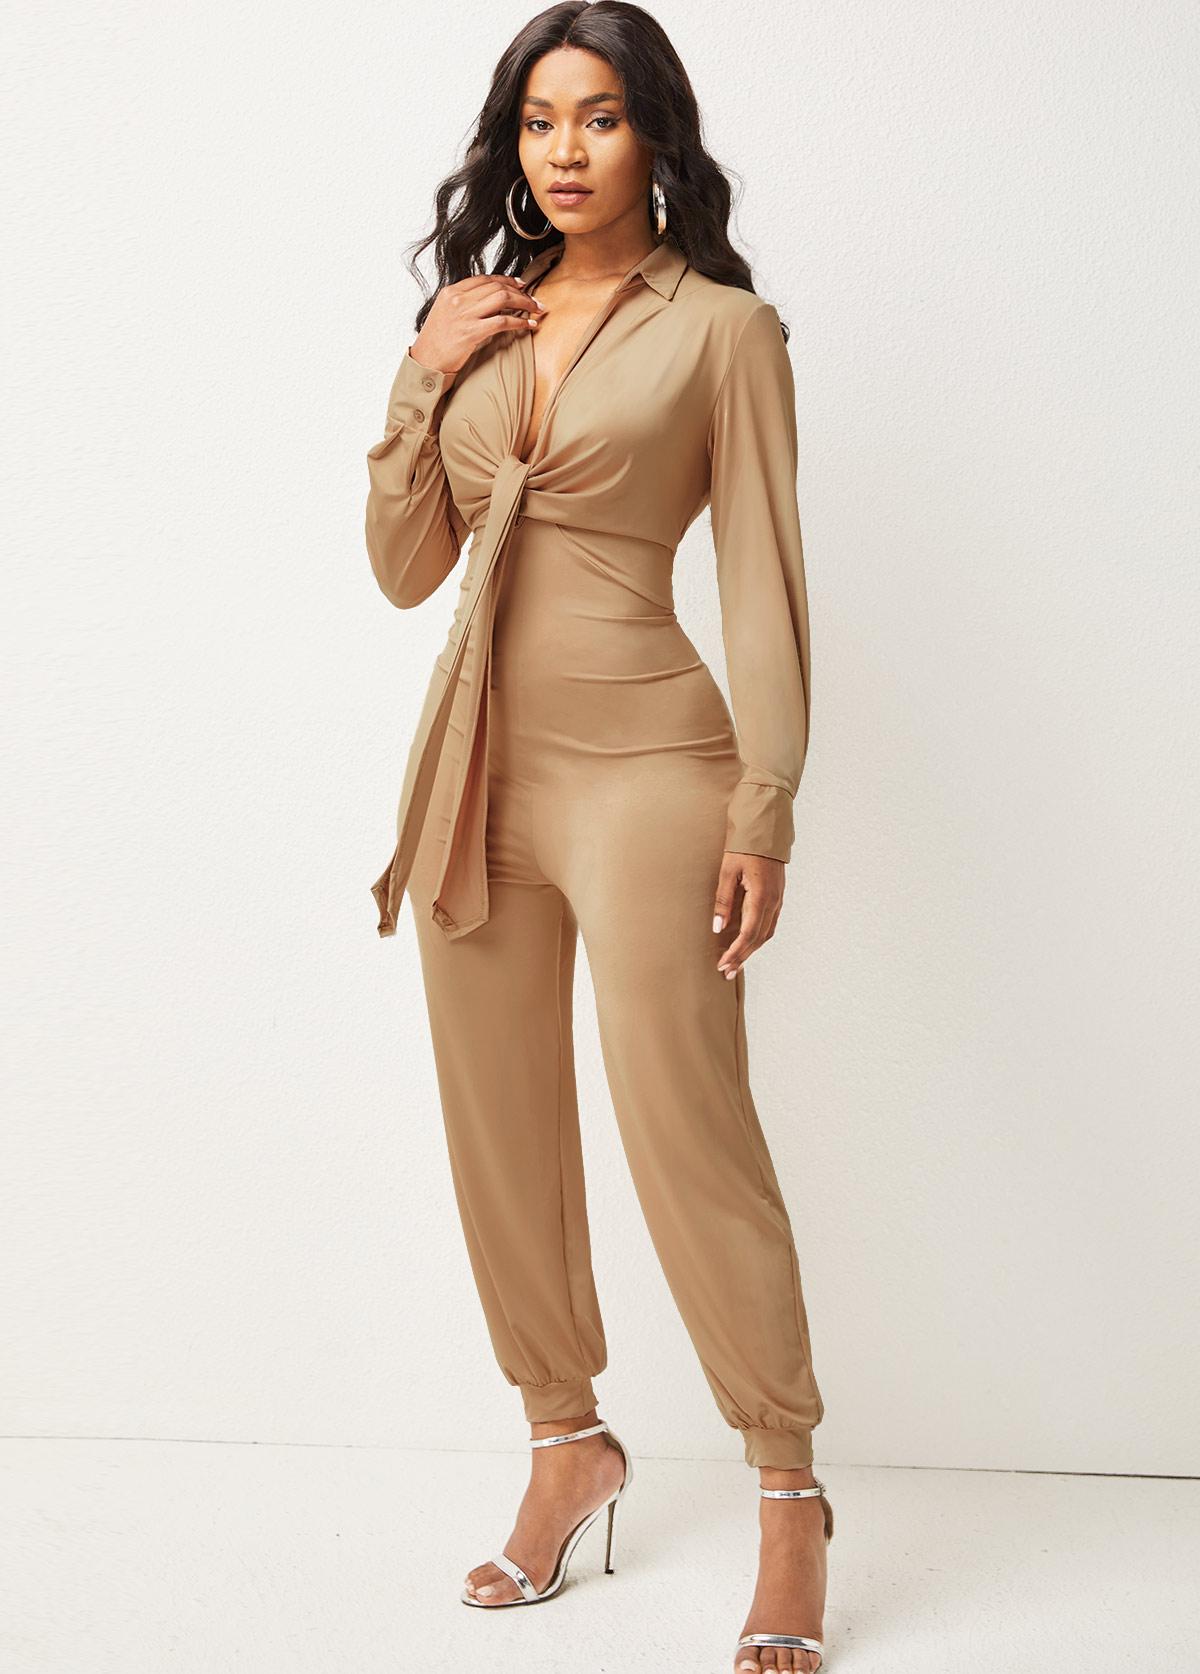 Long Sleeve Solid Turndown Collar Jumpsuit